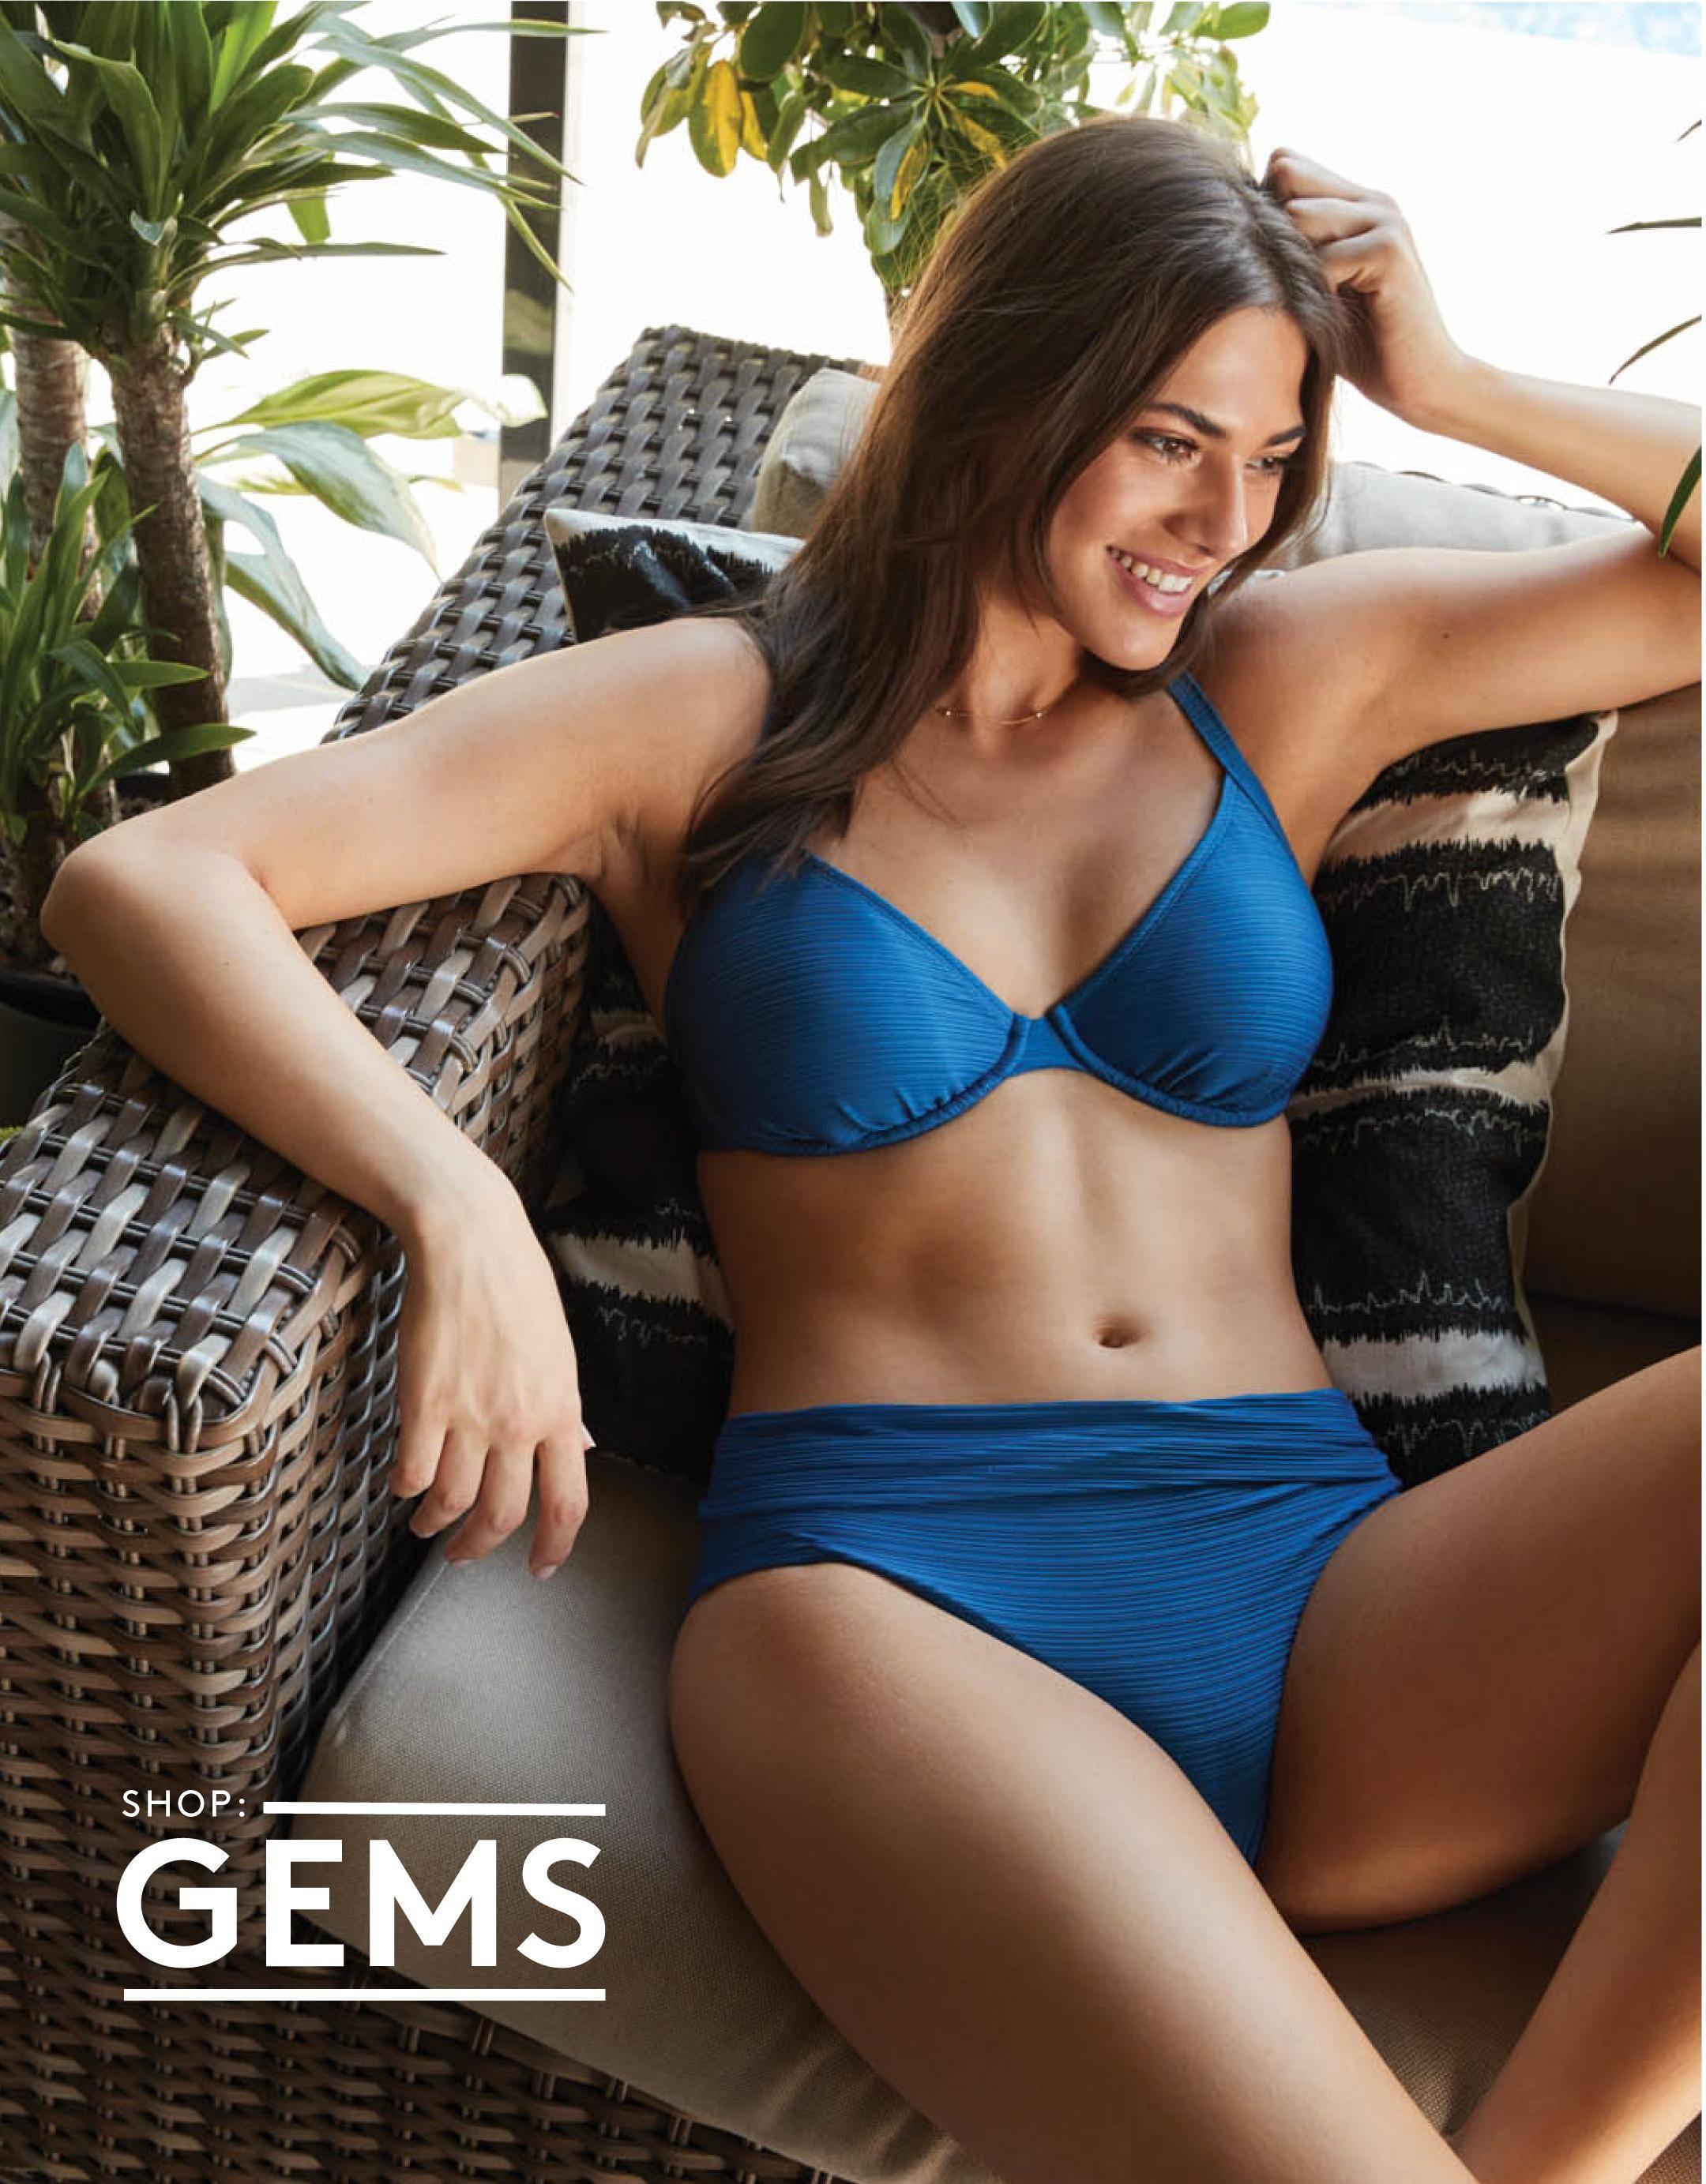 Shop SKYE's Gems Sale!